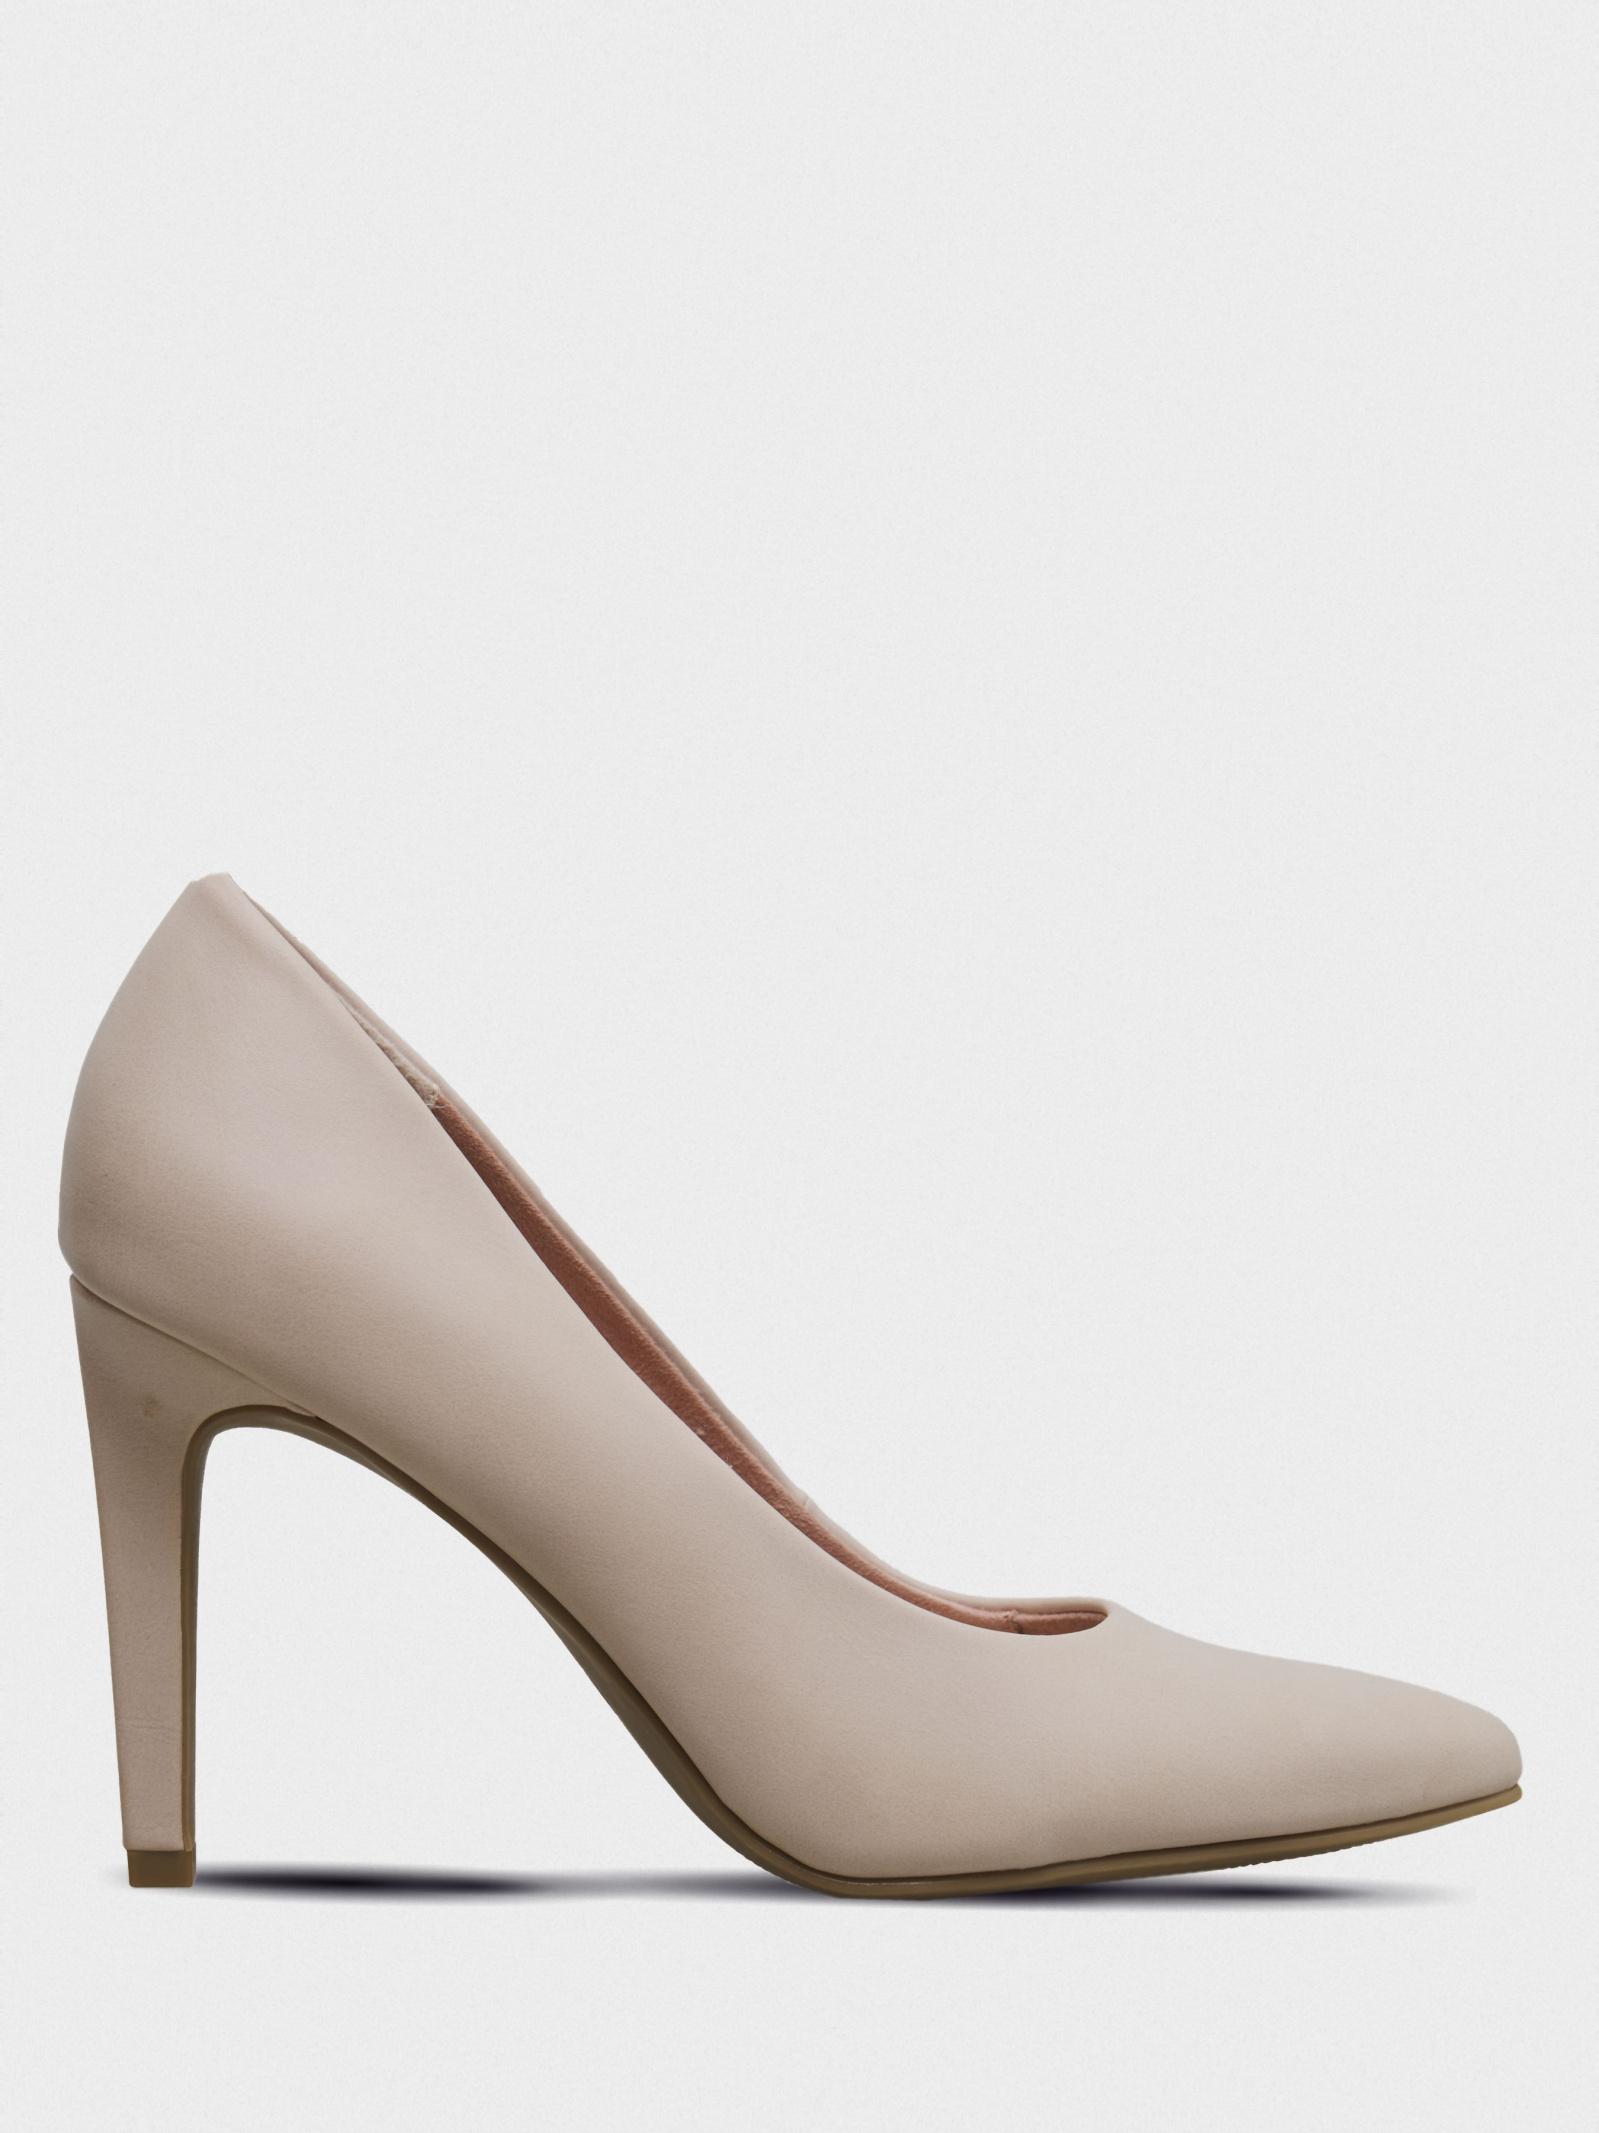 Туфли женские Marco Tozzi 3H307 цена, 2017